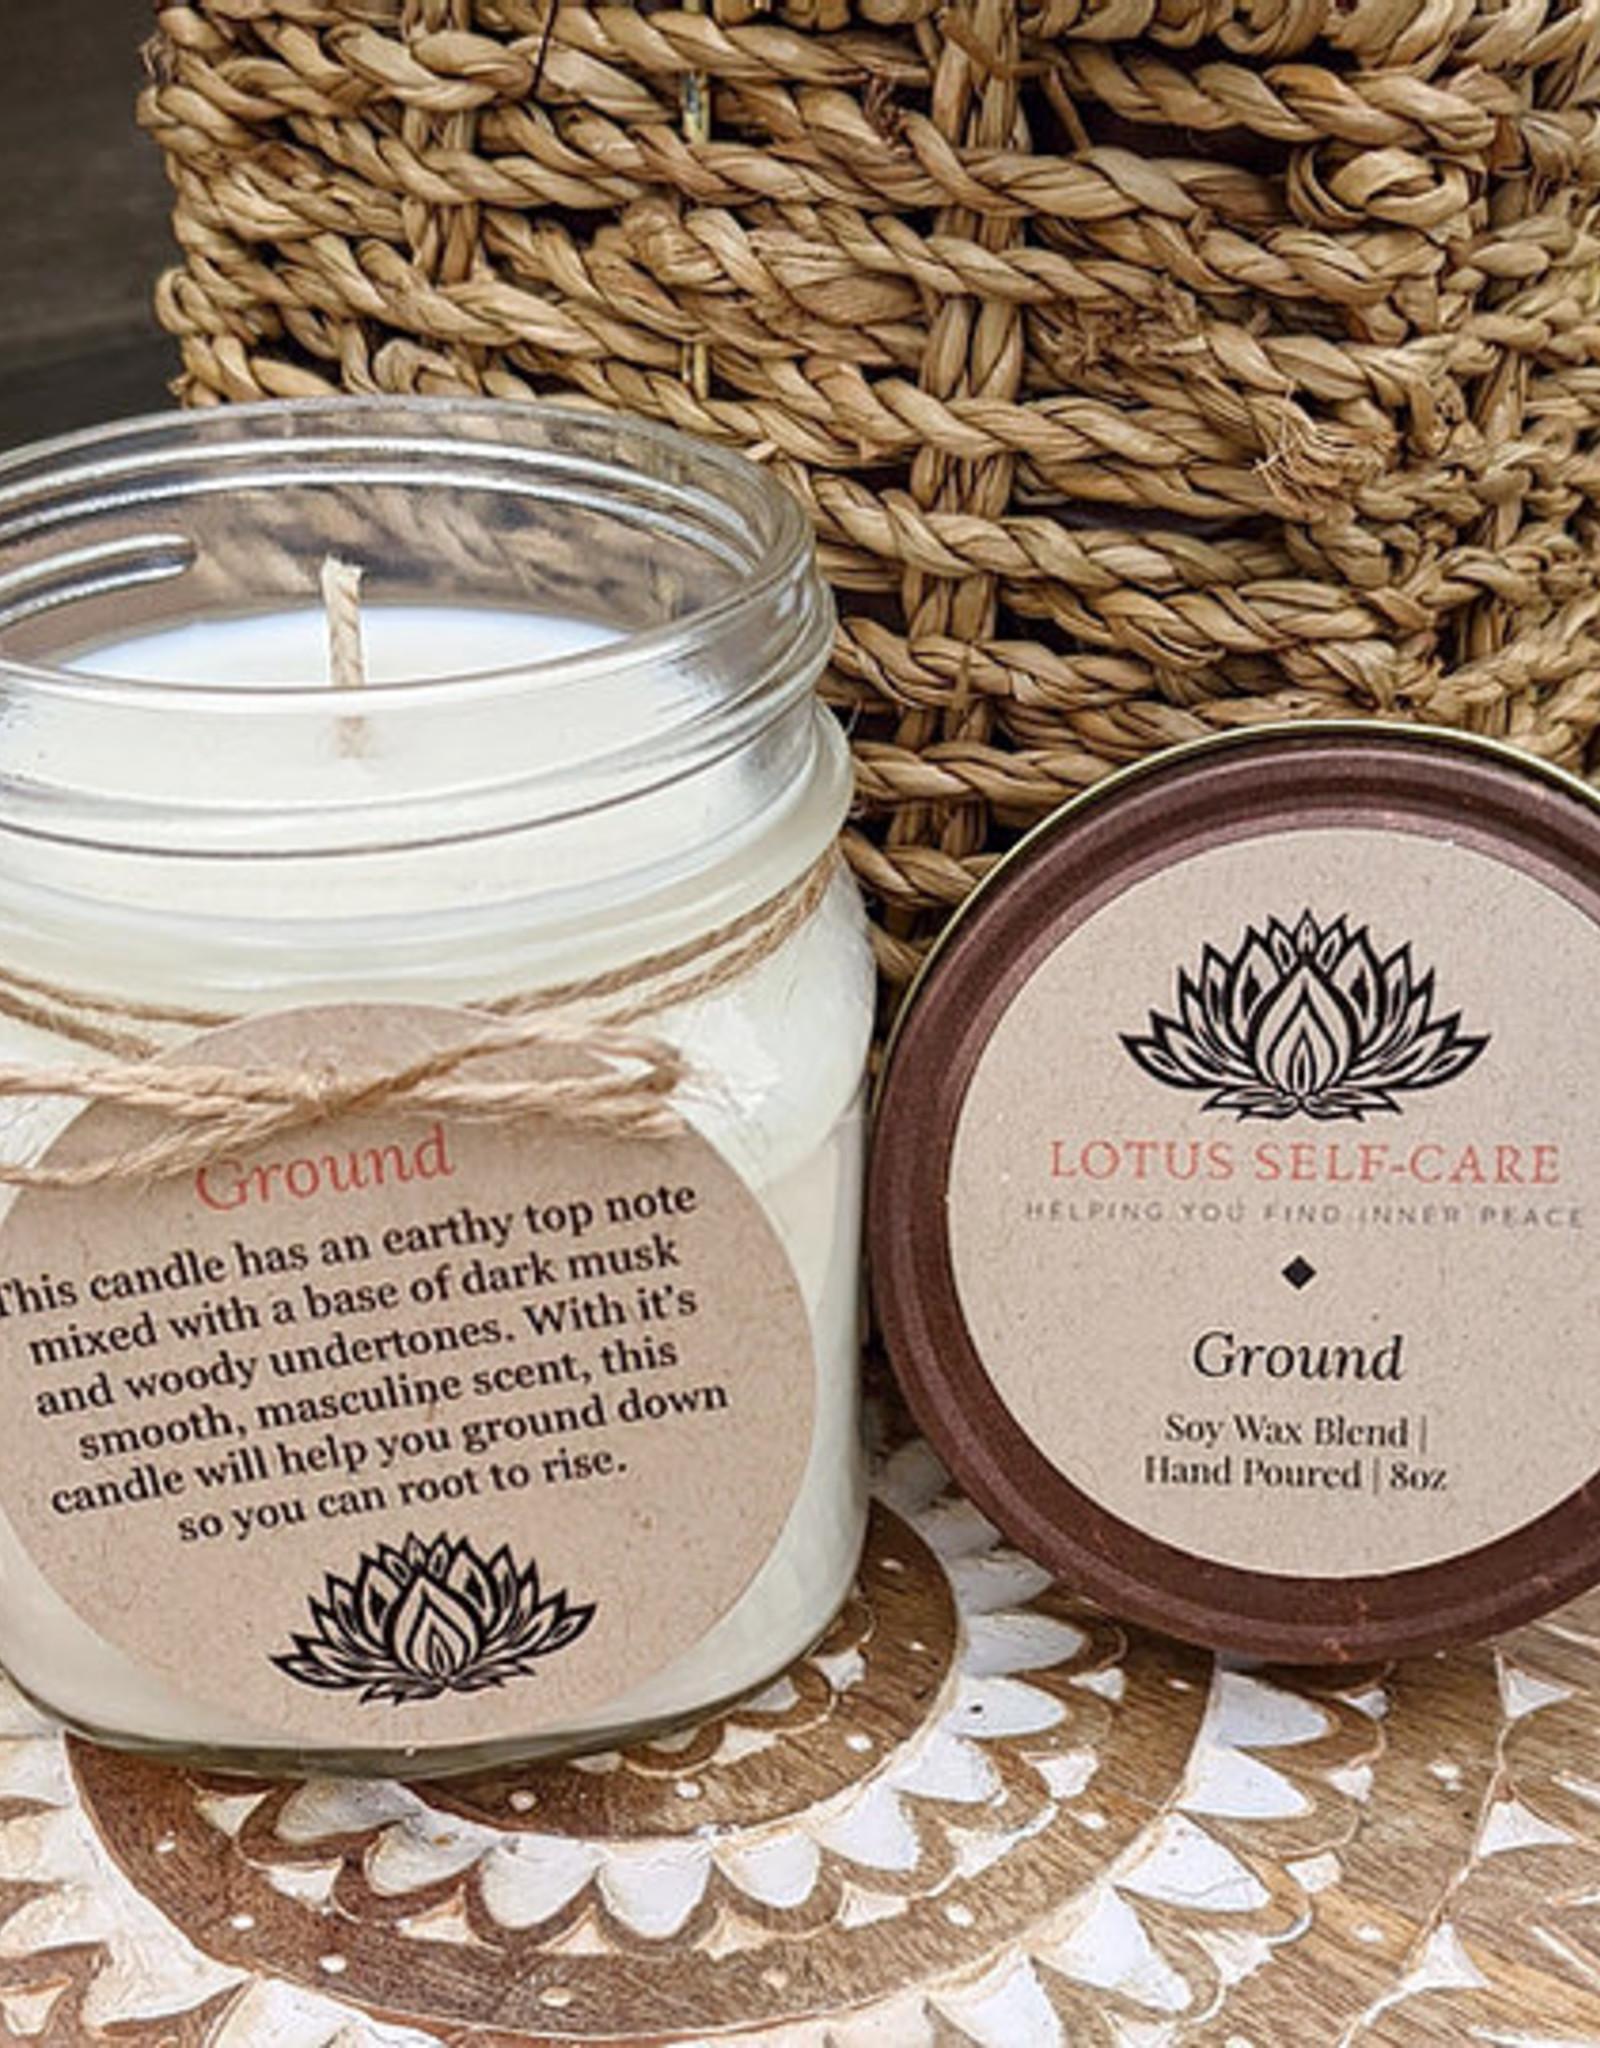 Lotus Self-Care Handmade Lotus Self-Care Medium Jar Candle